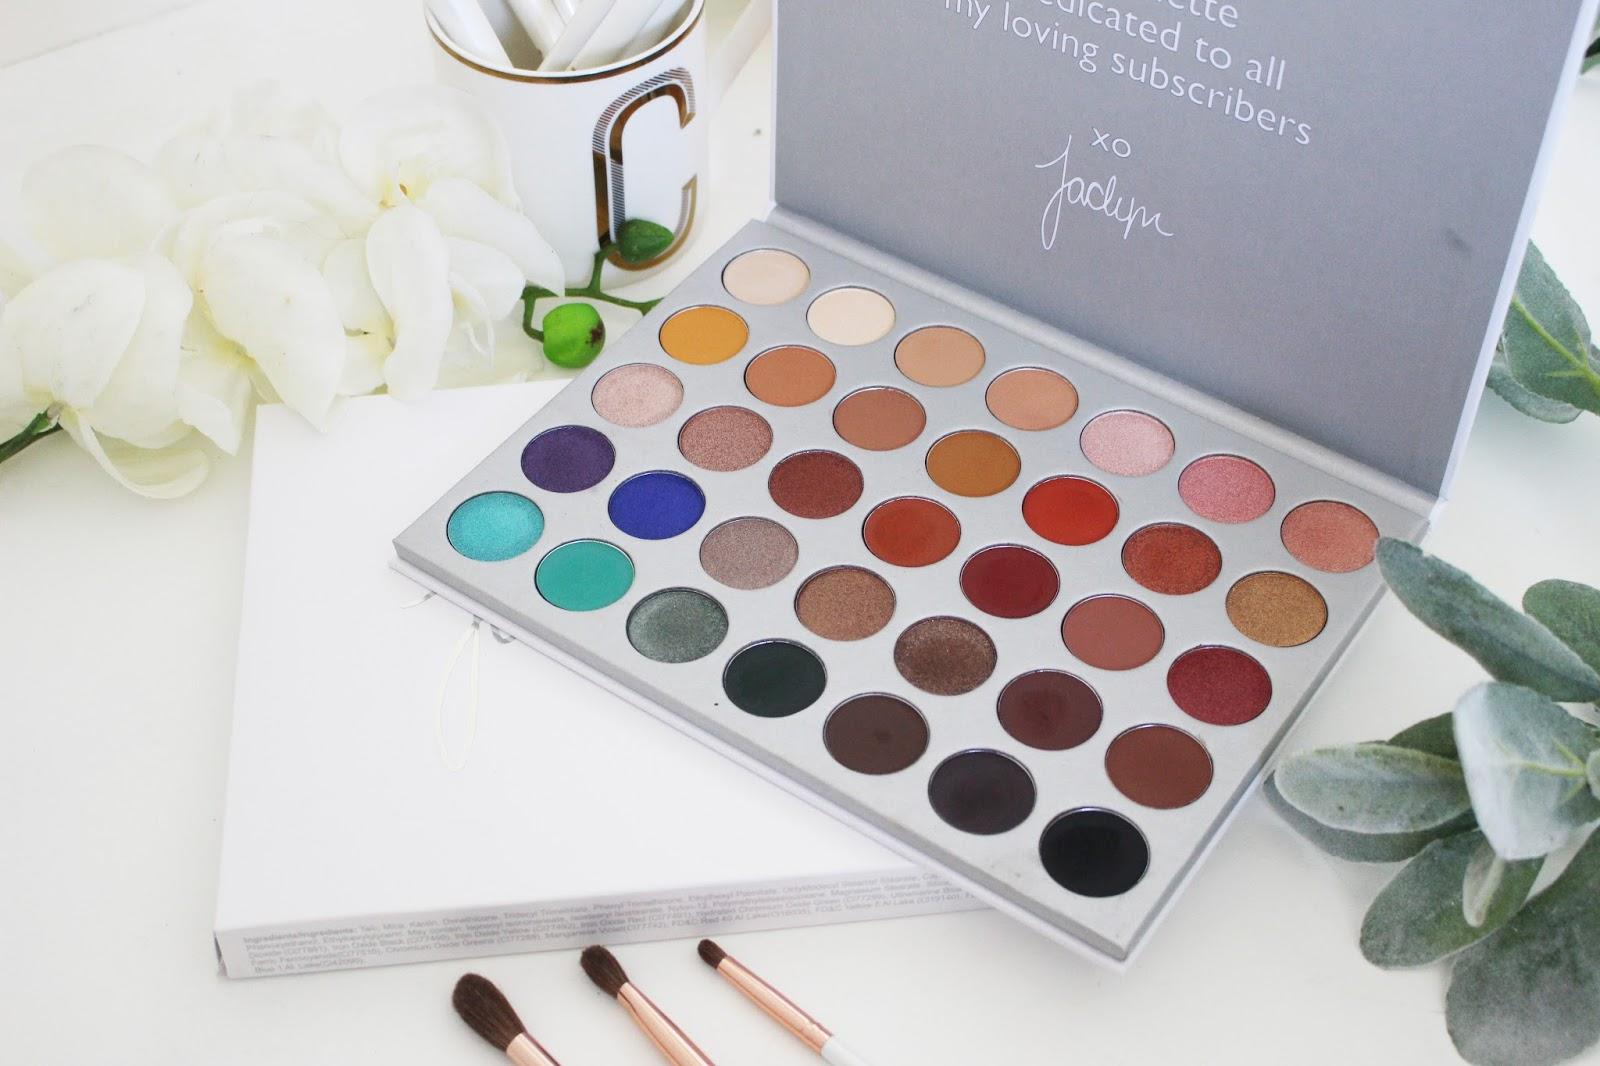 jaclyn hill eyeshadow palette